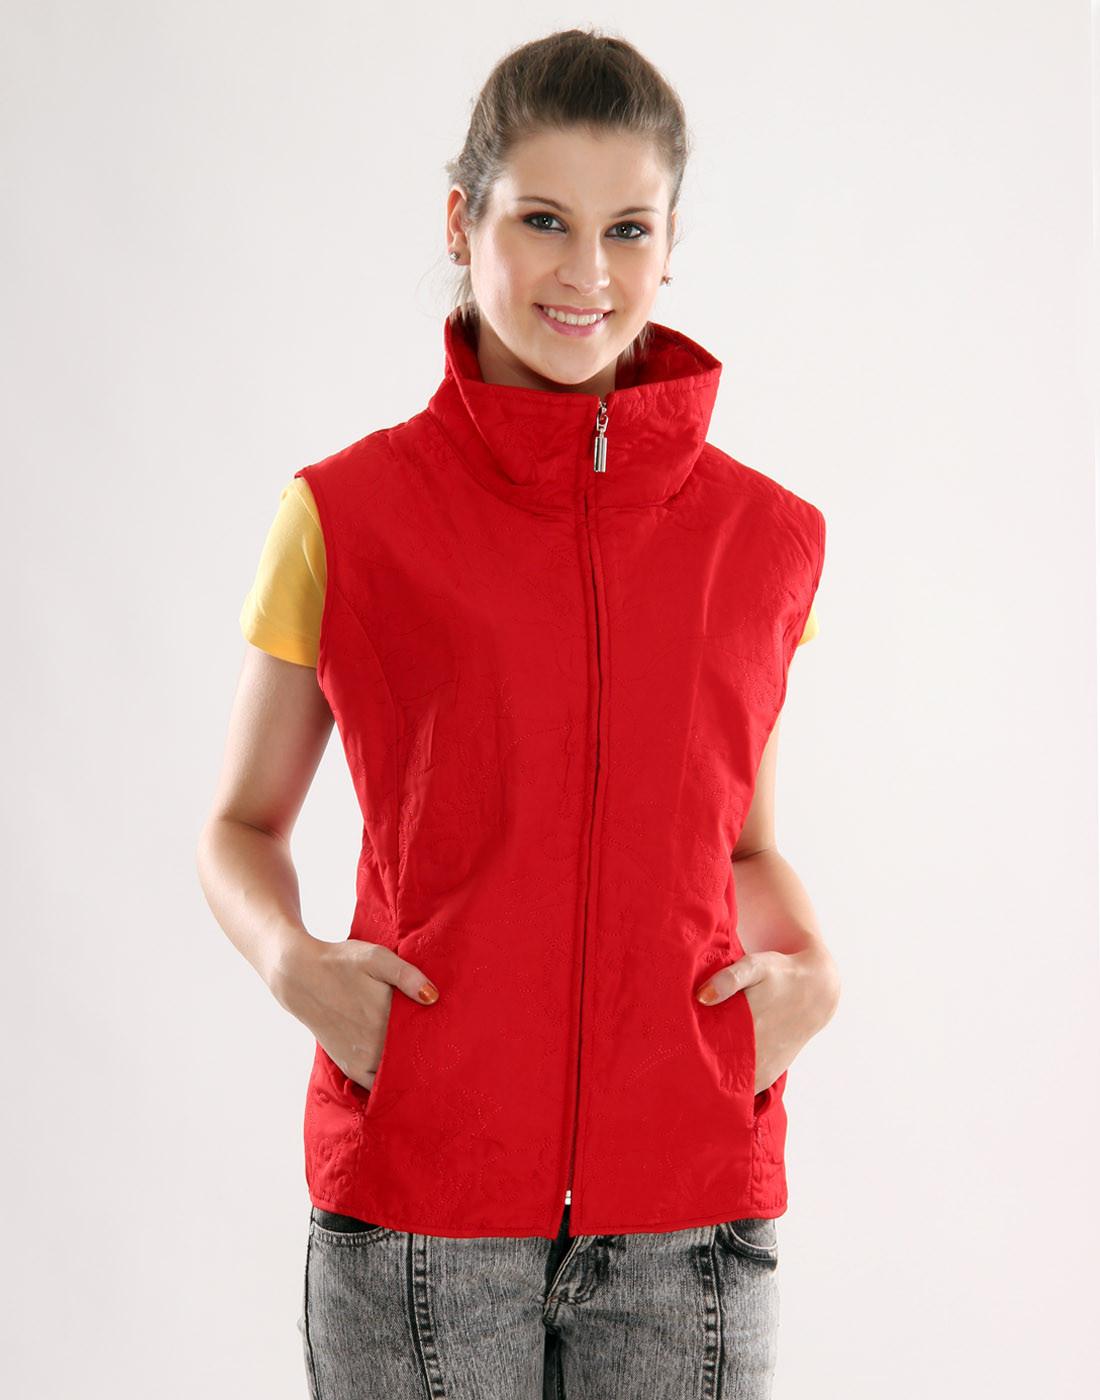 Sportelle USA India Sleeveless Solid Womens Jacket